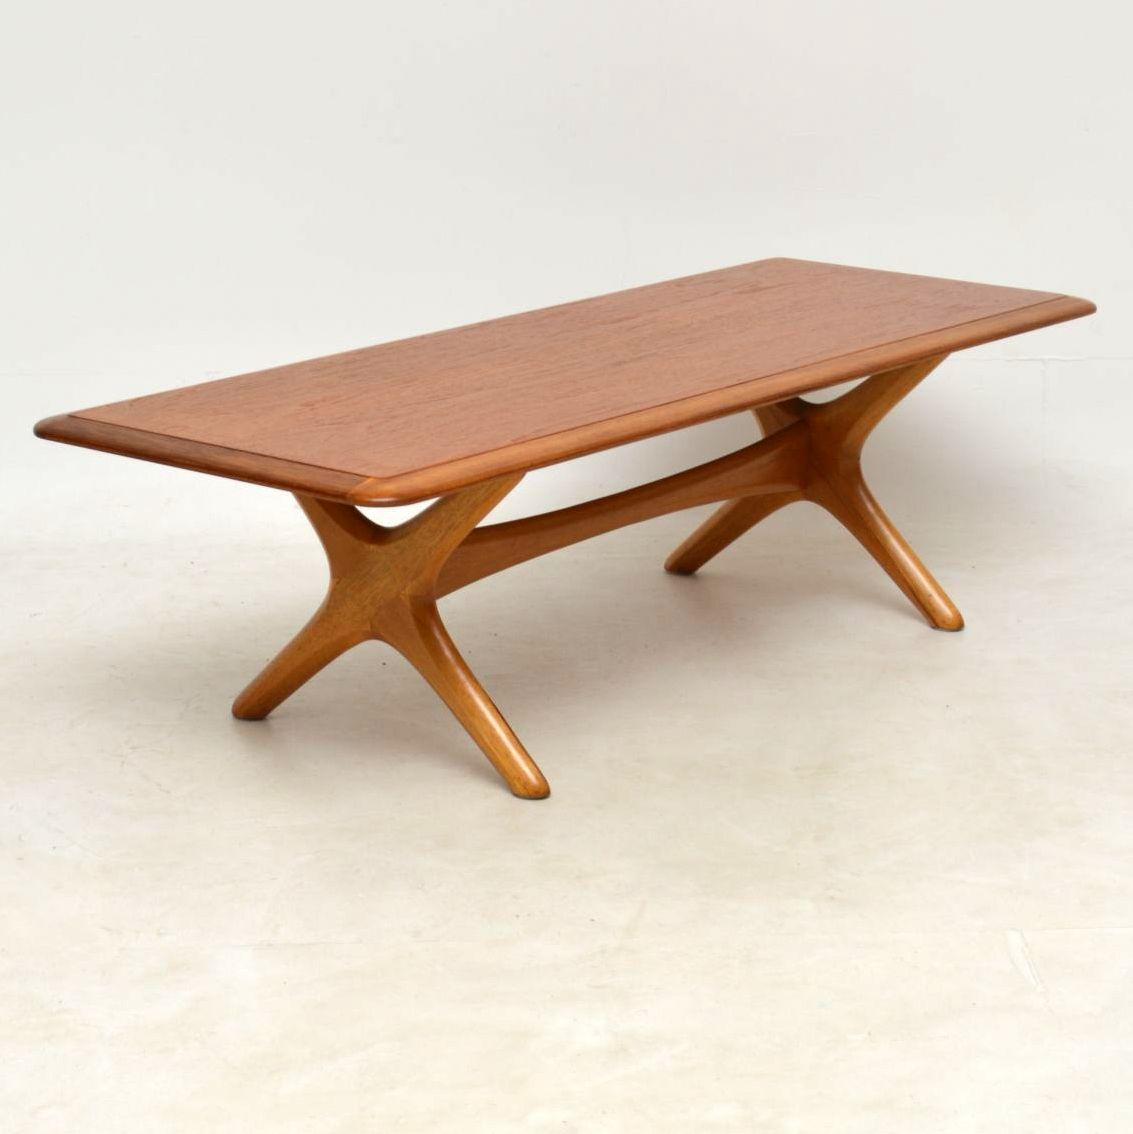 1960 S Danish Teak Vintage Coffee Table Retrospective